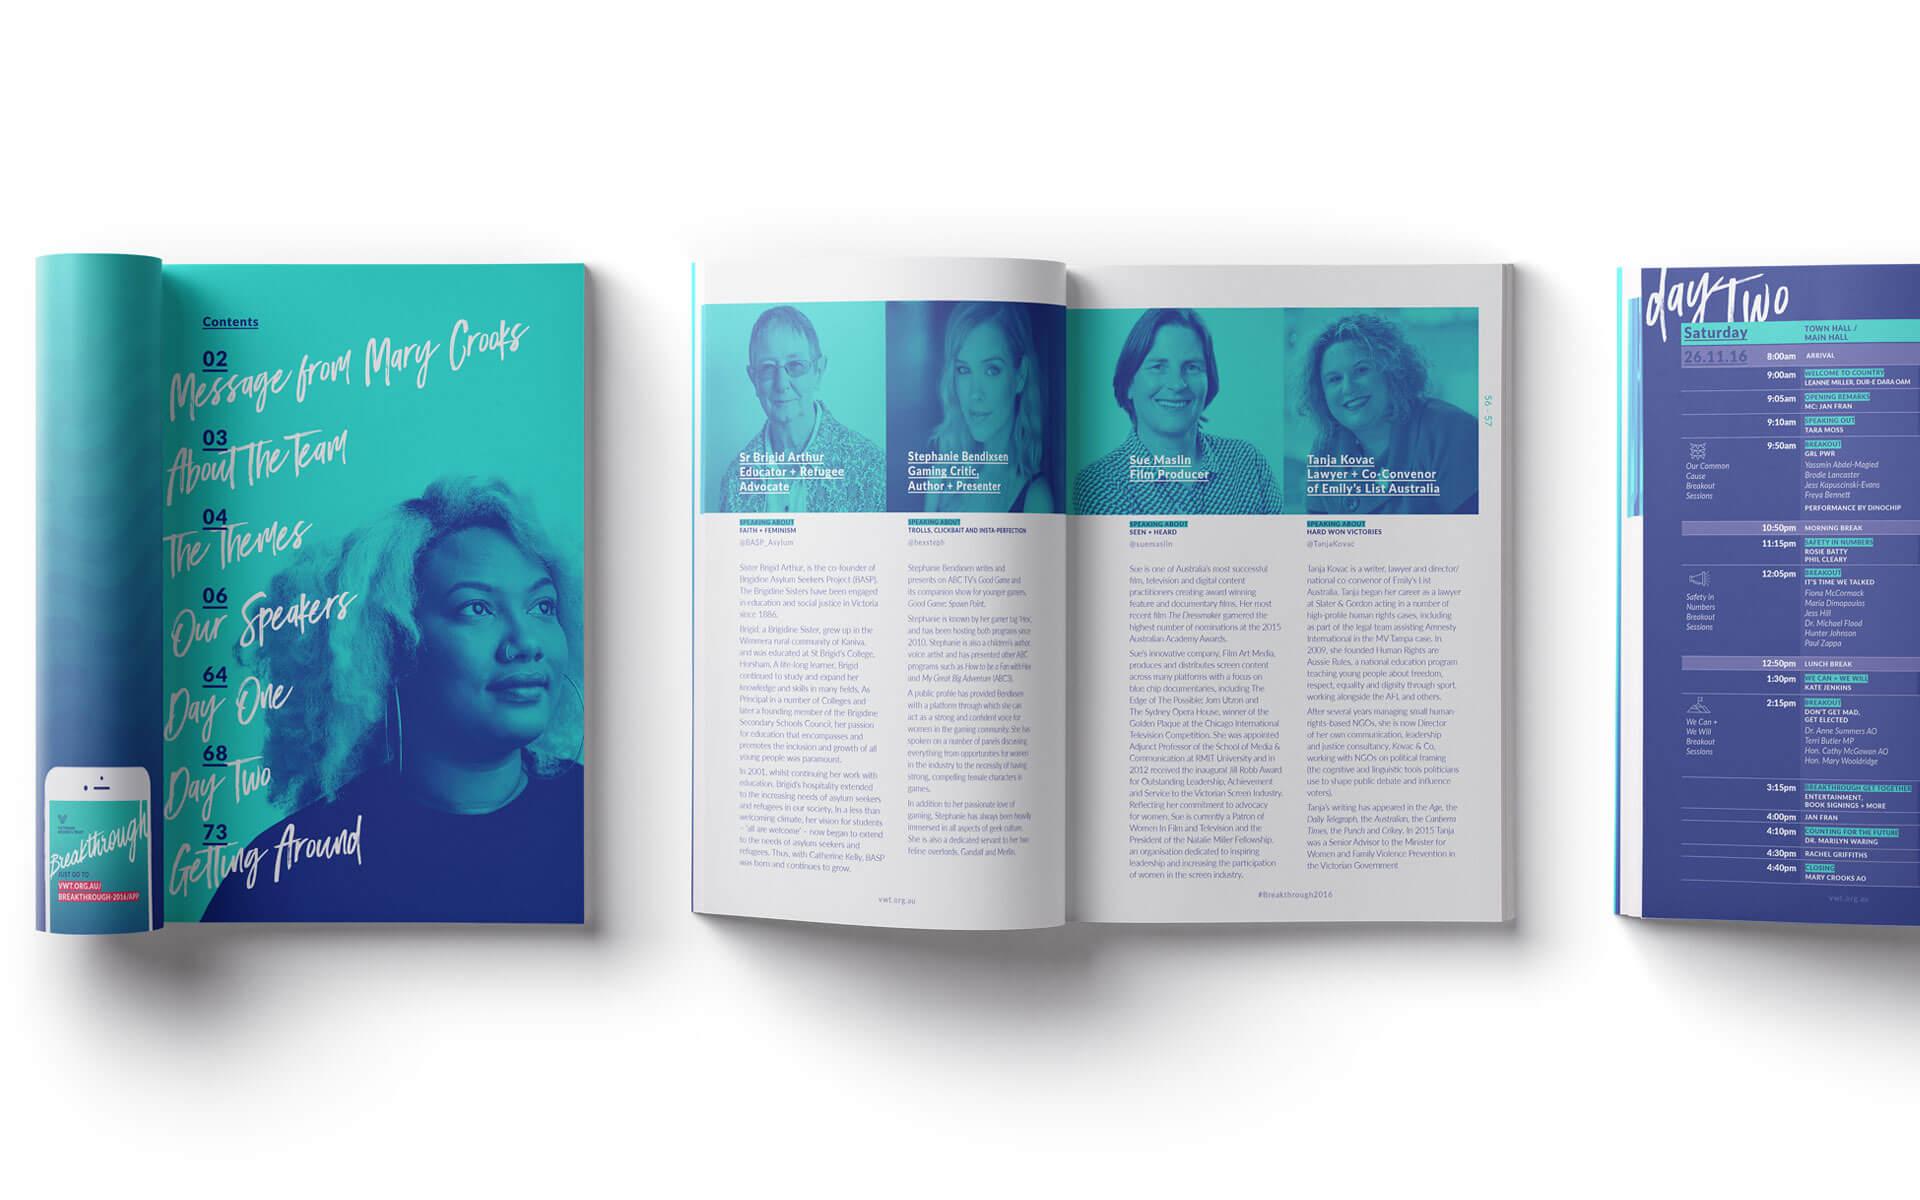 Breakthrough program pages.